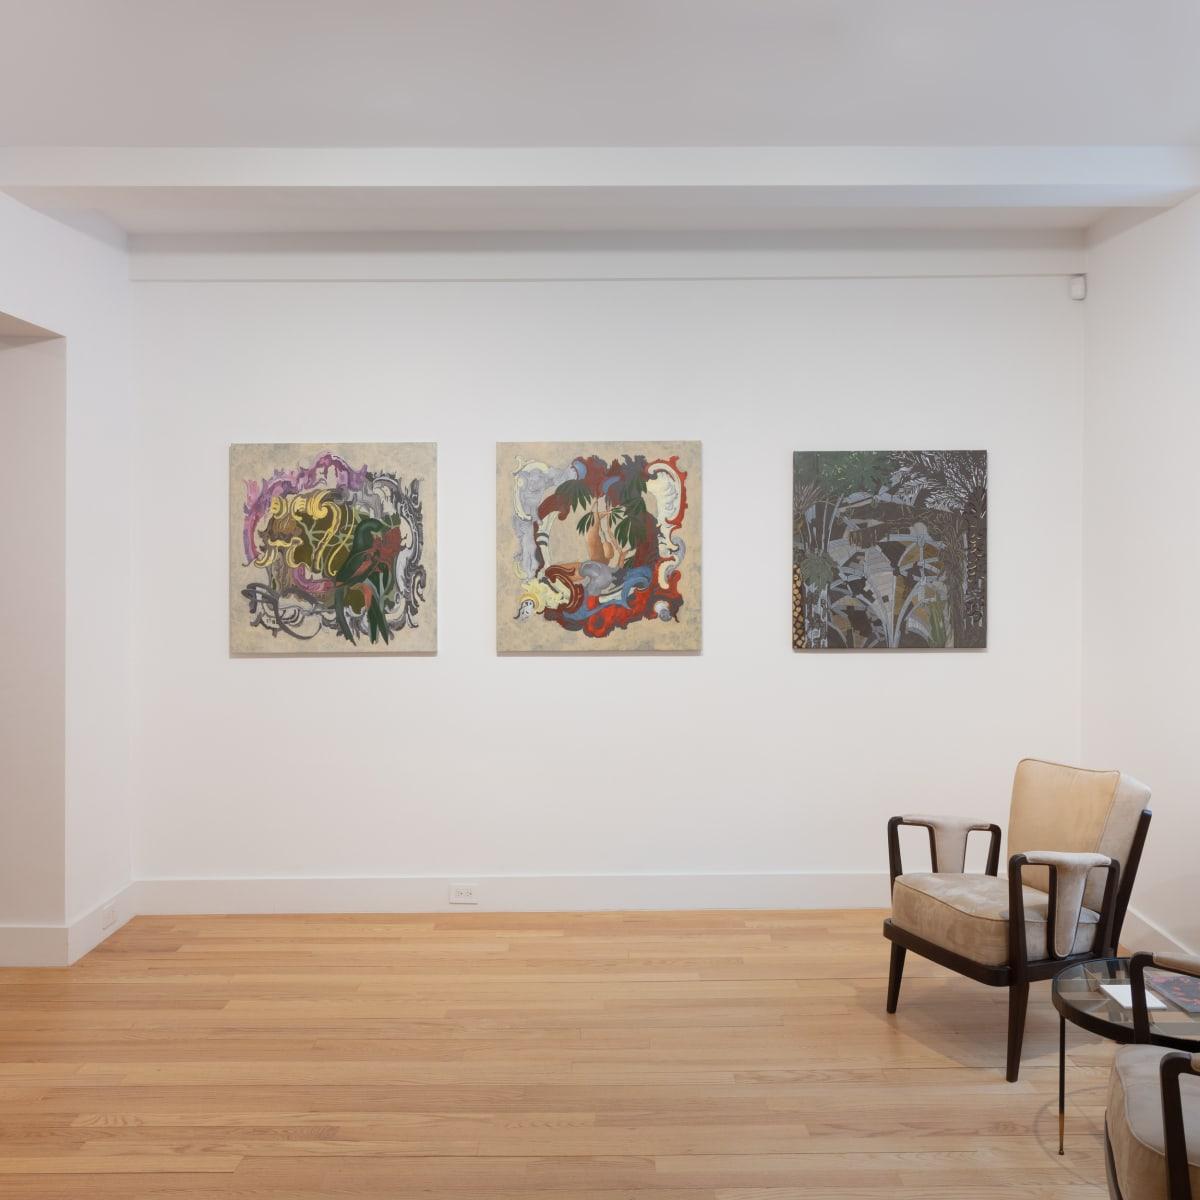 Installation image, Debora Hirsch: Firmamento, Hutchinson Modern & Contemporary, 2021